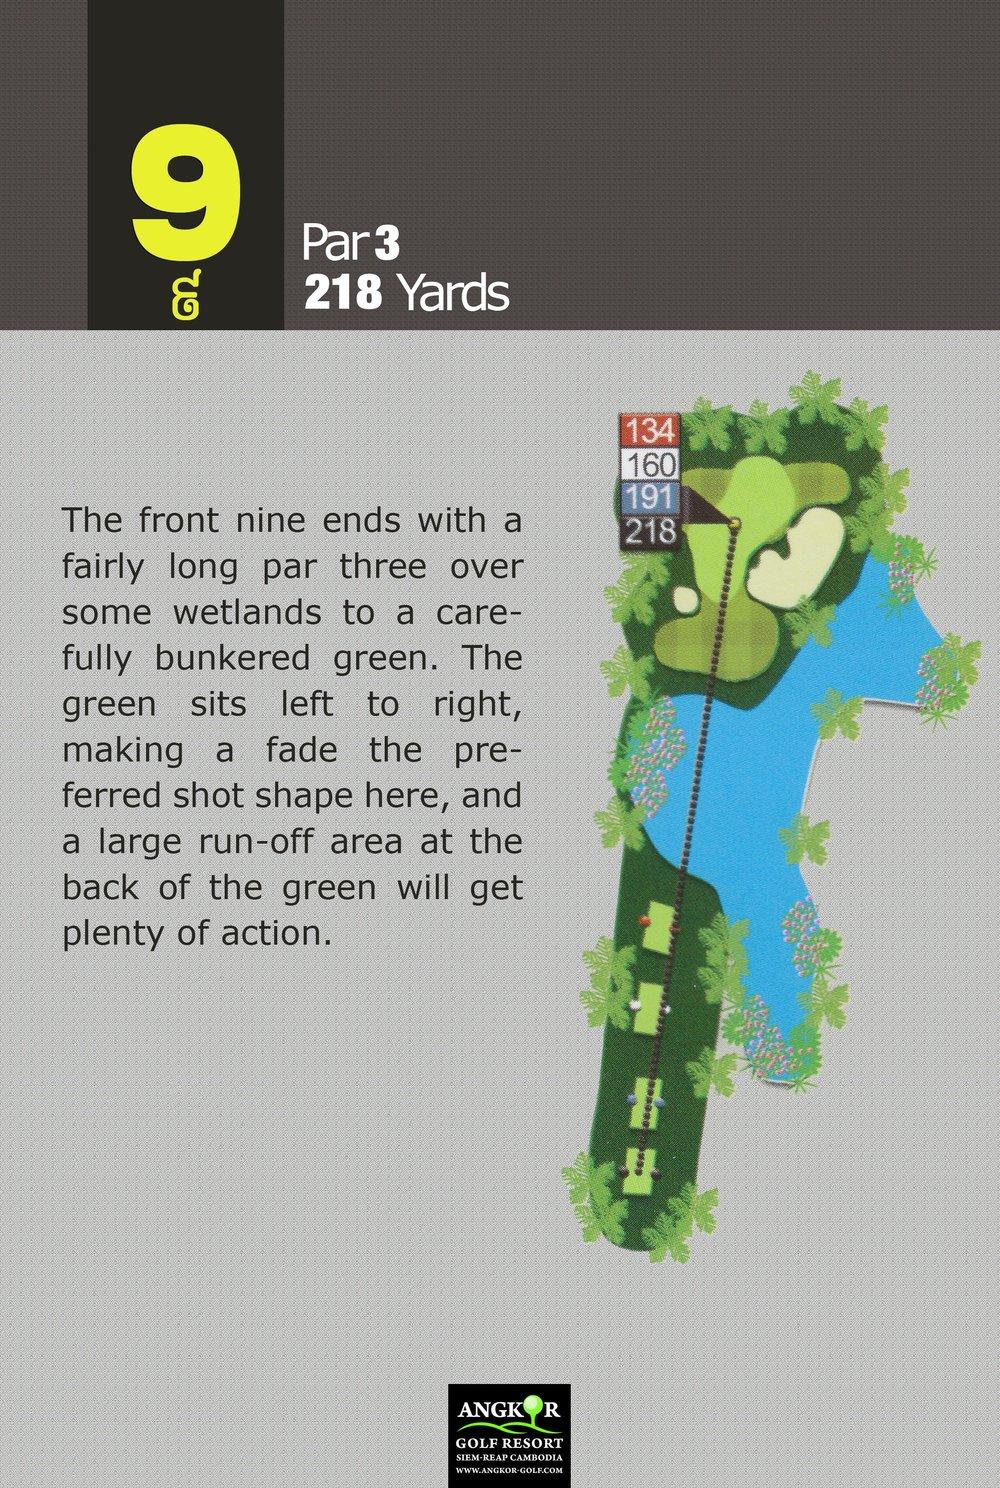 Hole 9 - Par 3 218 Yards